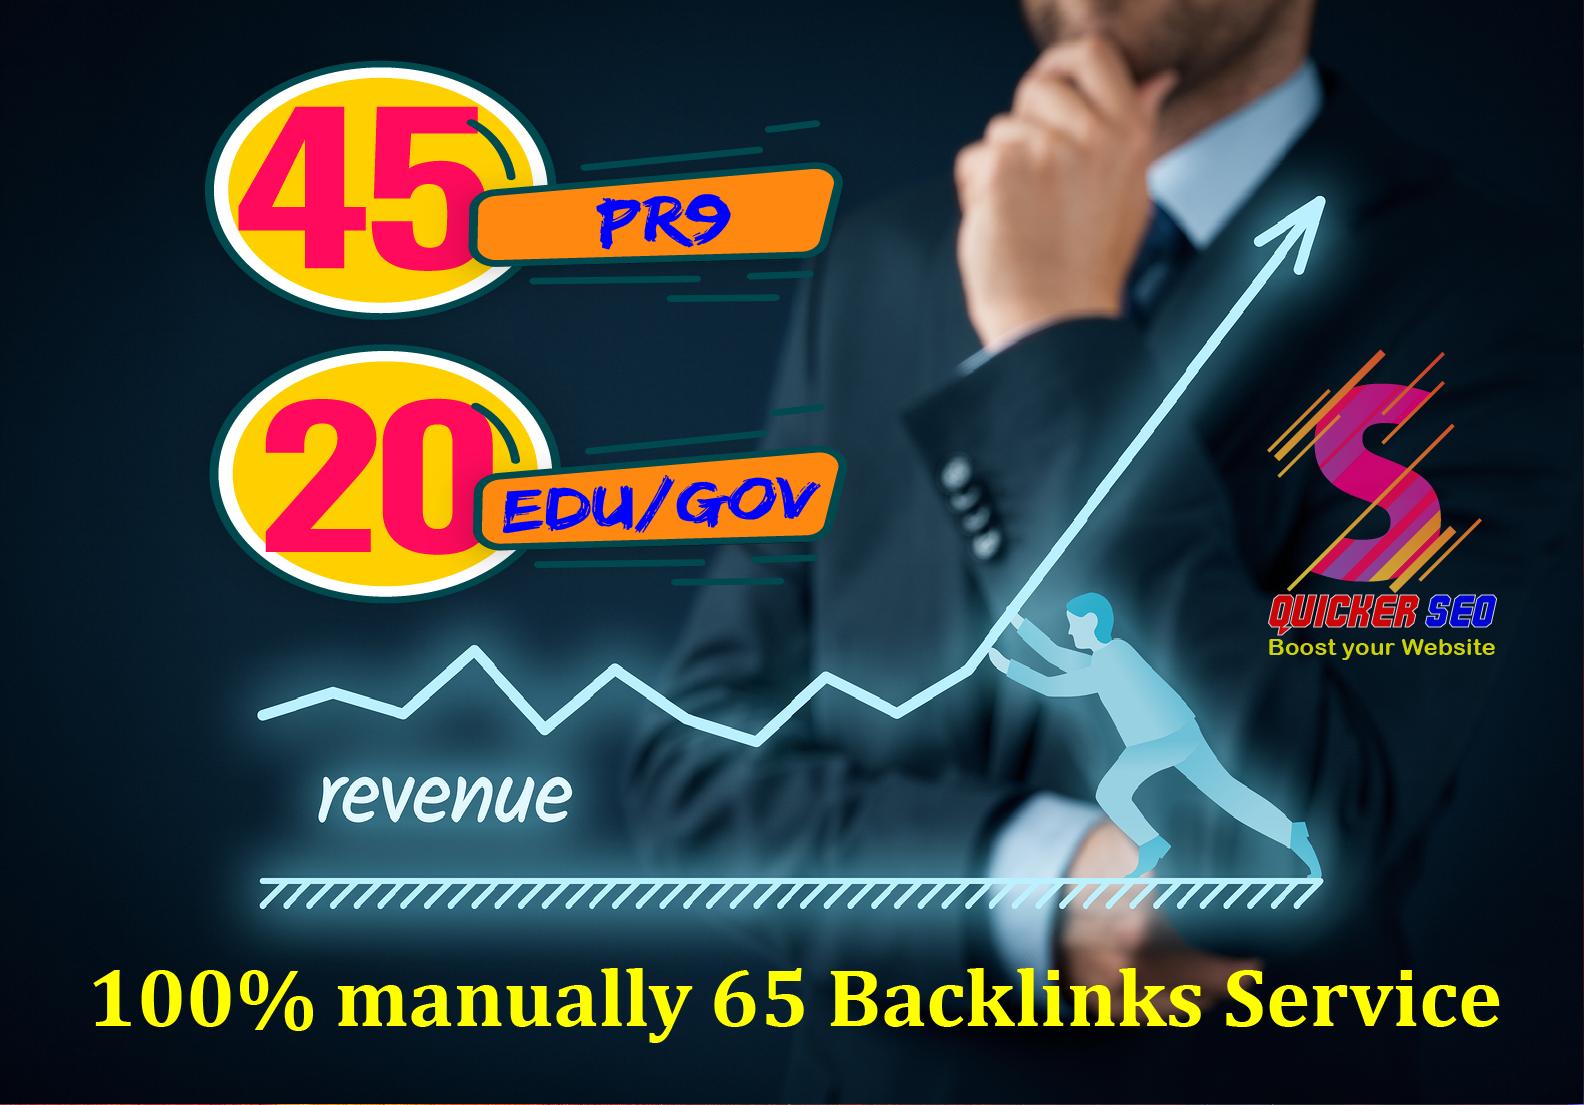 45 Pr9 Dofollow + 20 Edu - Gov High Authority SEO Backlinks - Fire Your Google Ranking